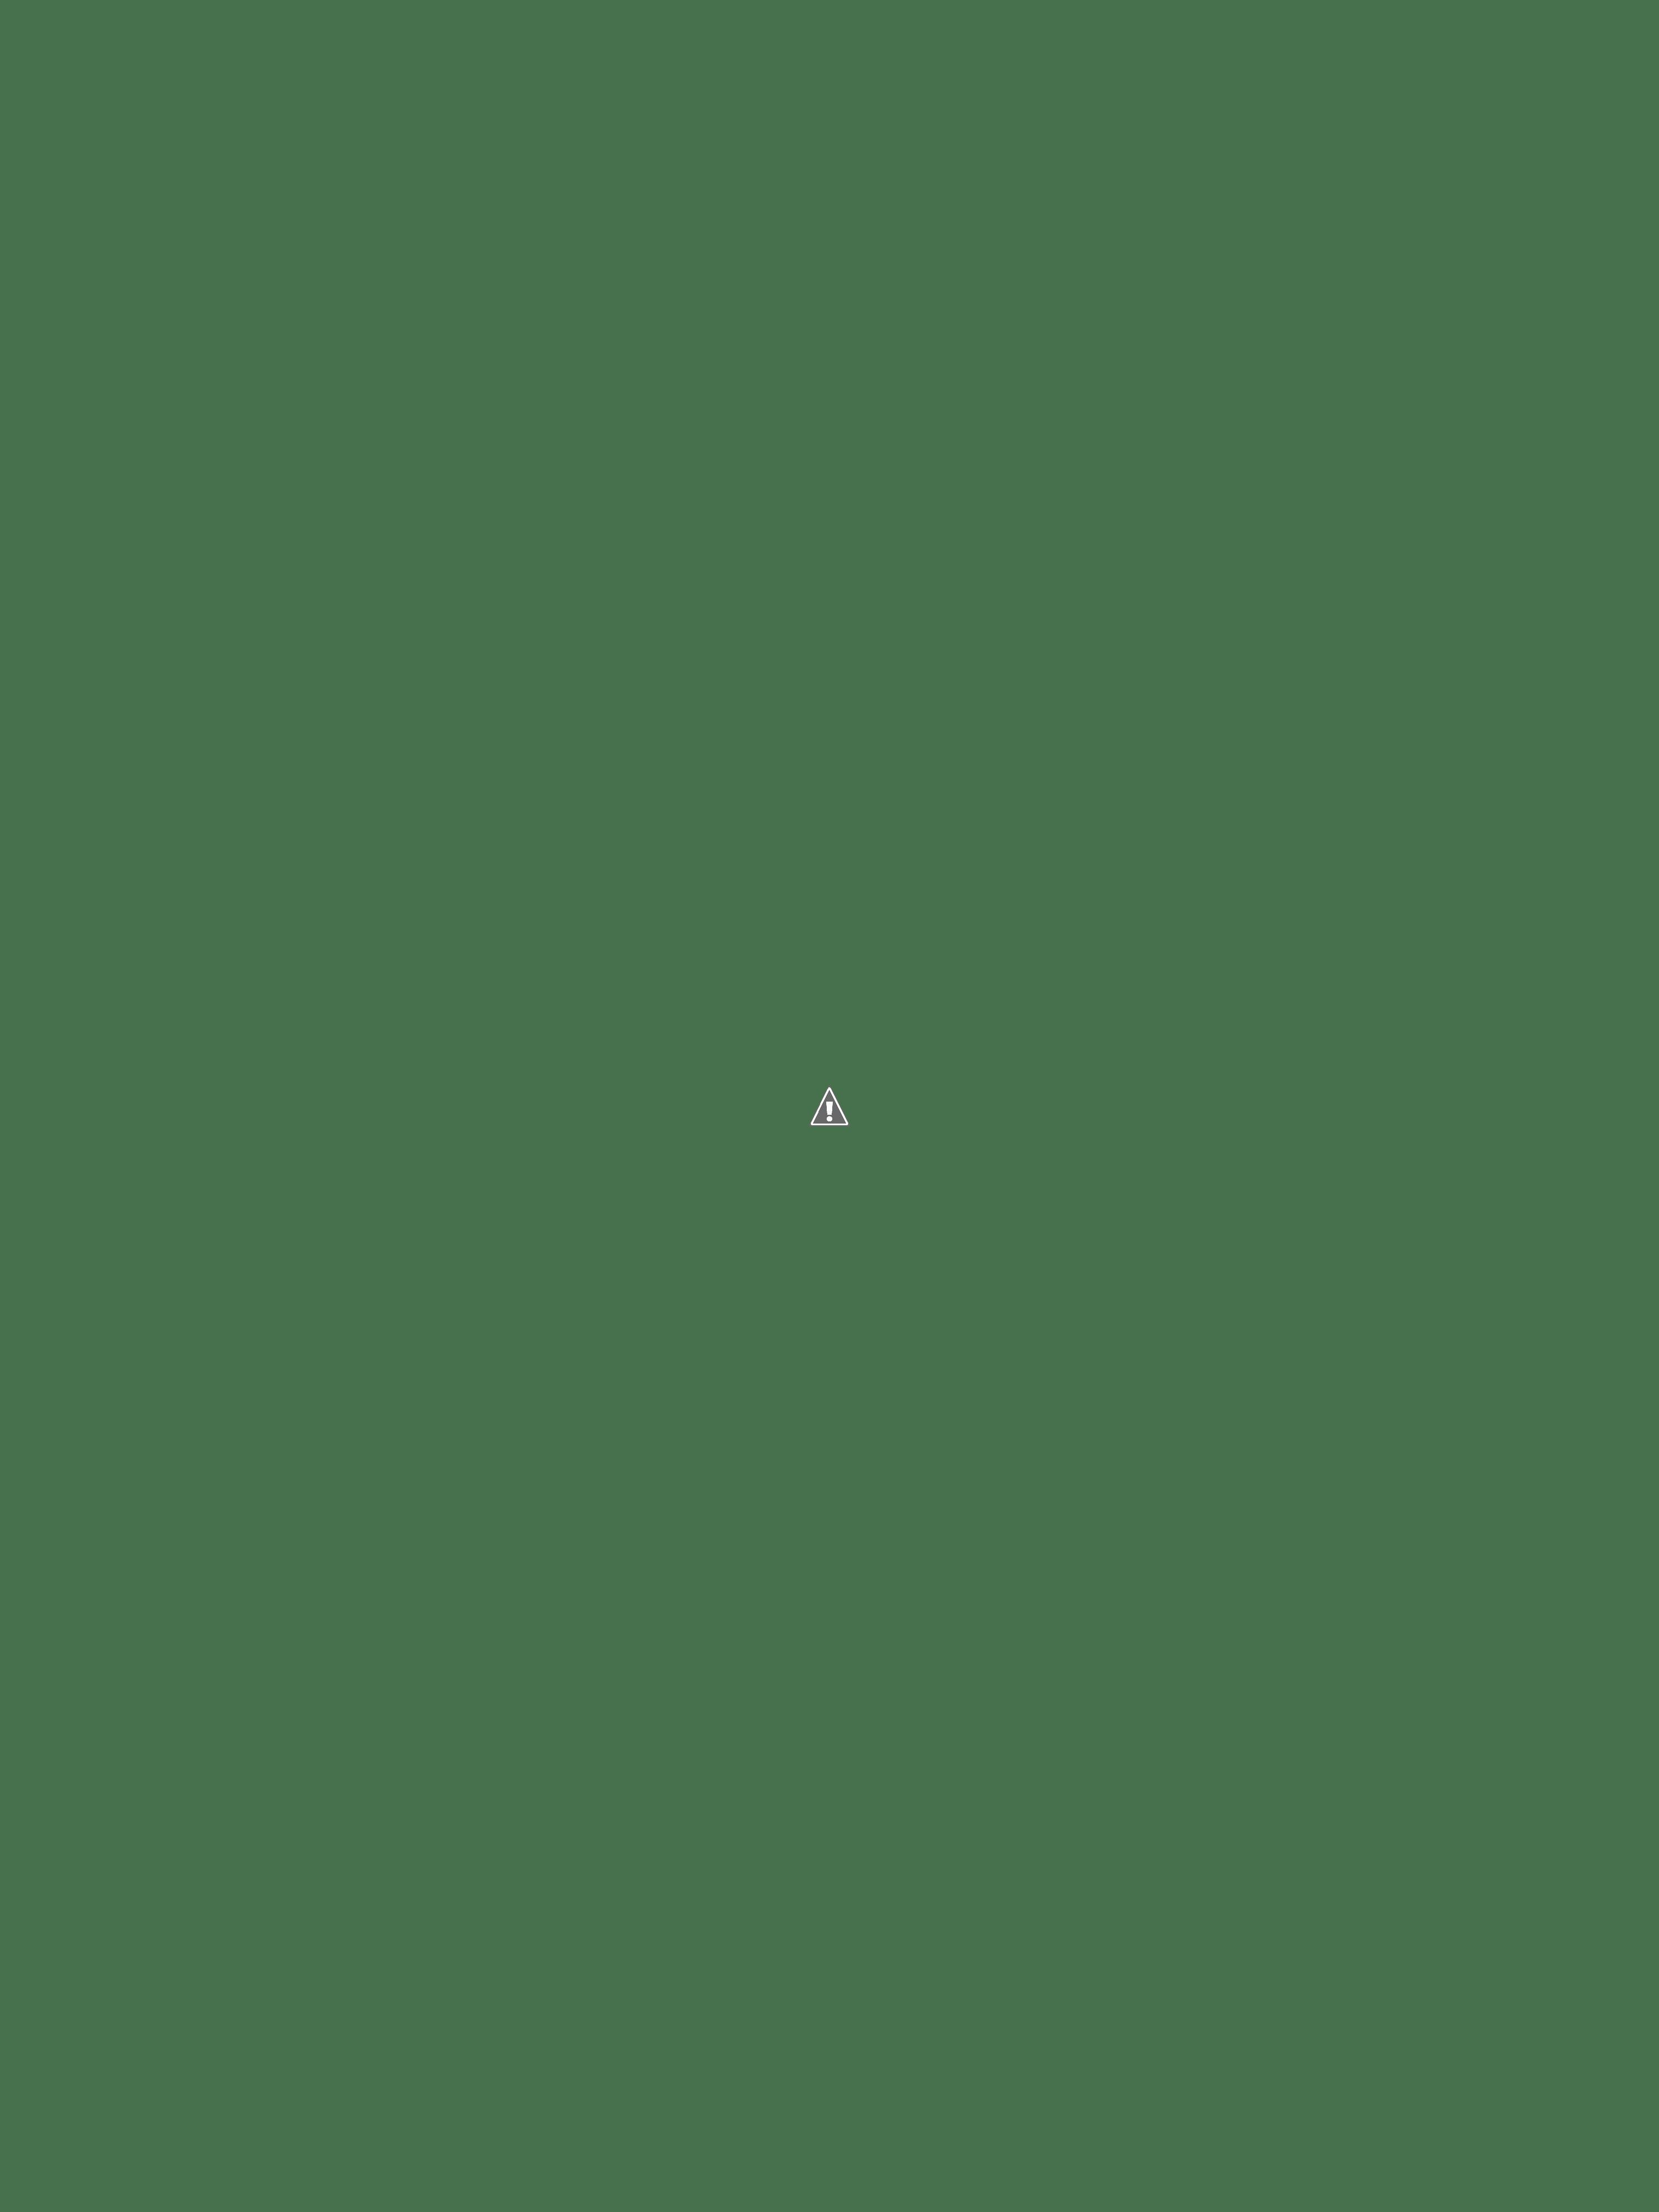 IMG 0263